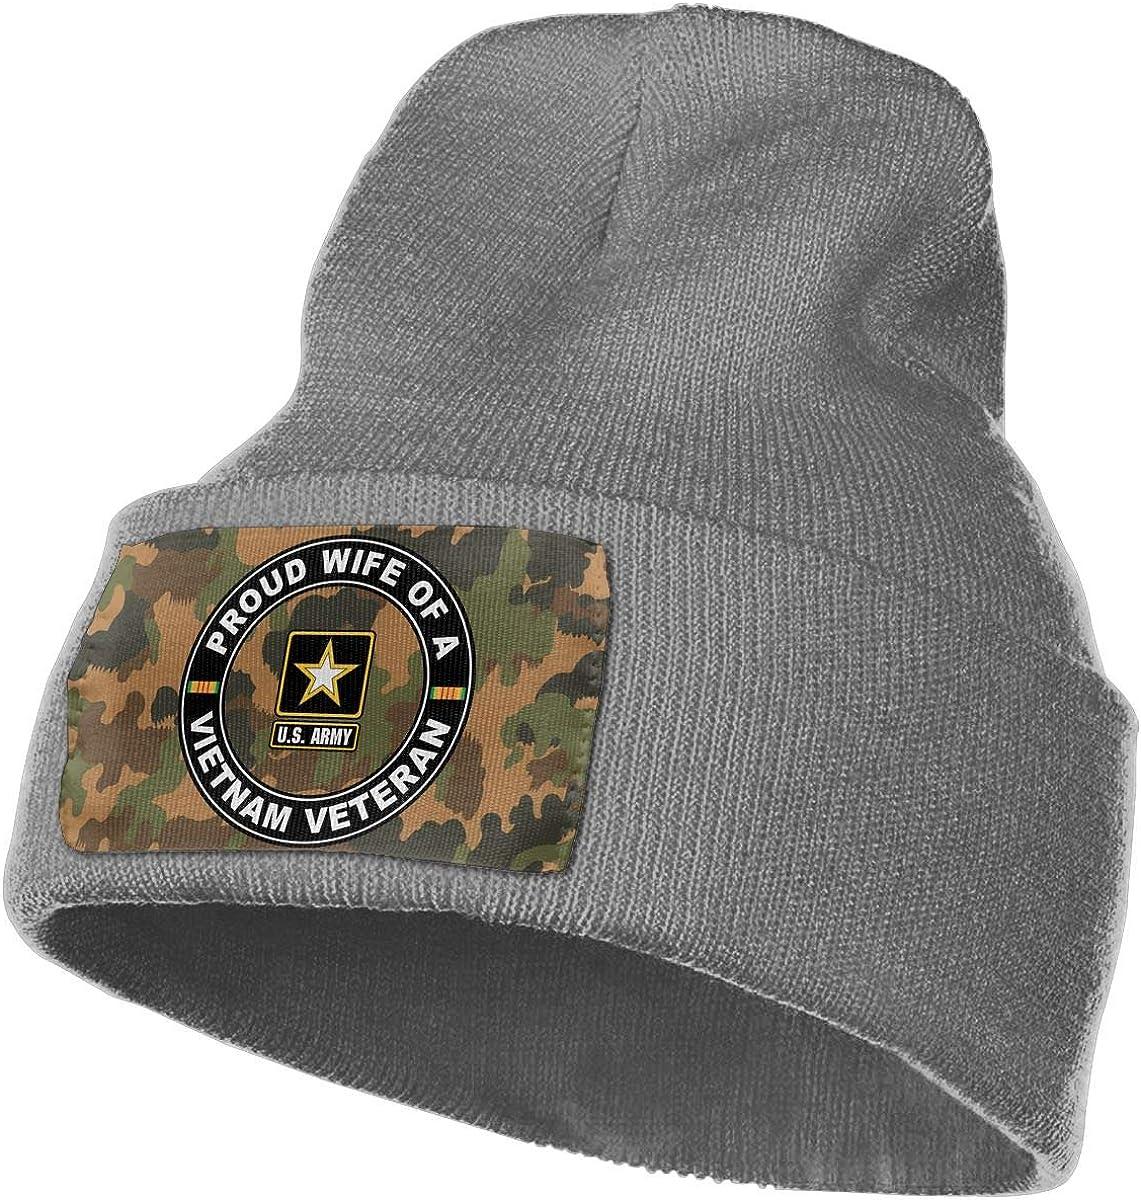 Army Proud Wife of A Vietnam Veteran Men/&Women Warm Winter Knit Plain Beanie Hat Skull Cap Acrylic Knit Cuff Hat U.S